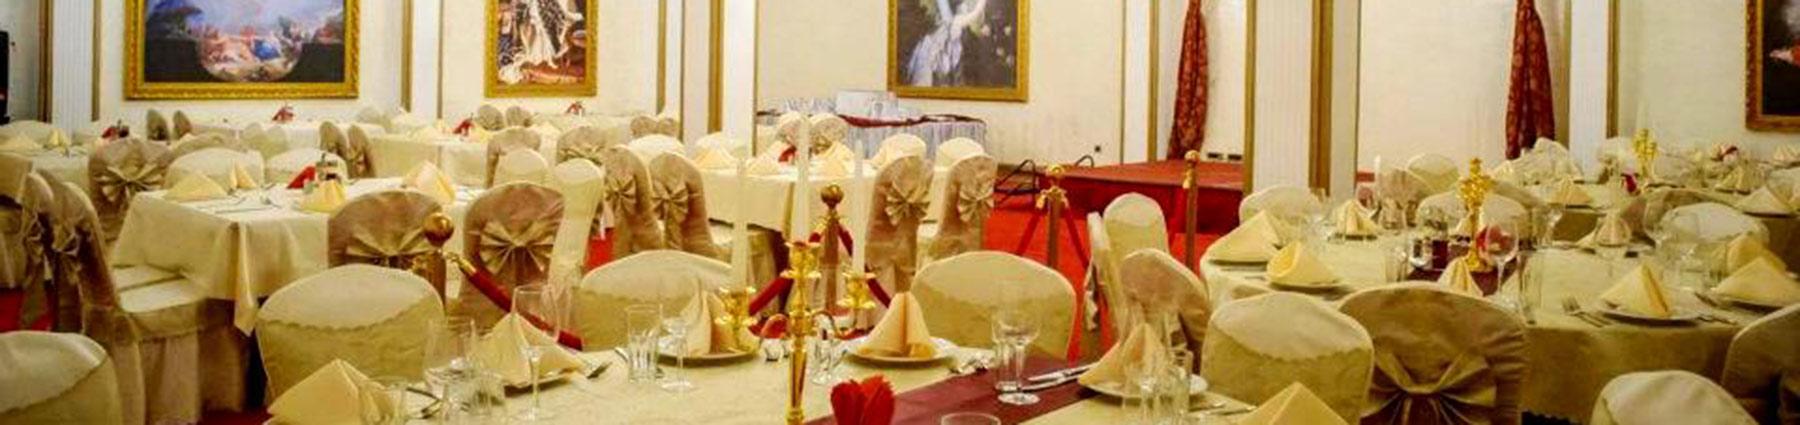 Restoran Premier Prezident Hotel *****